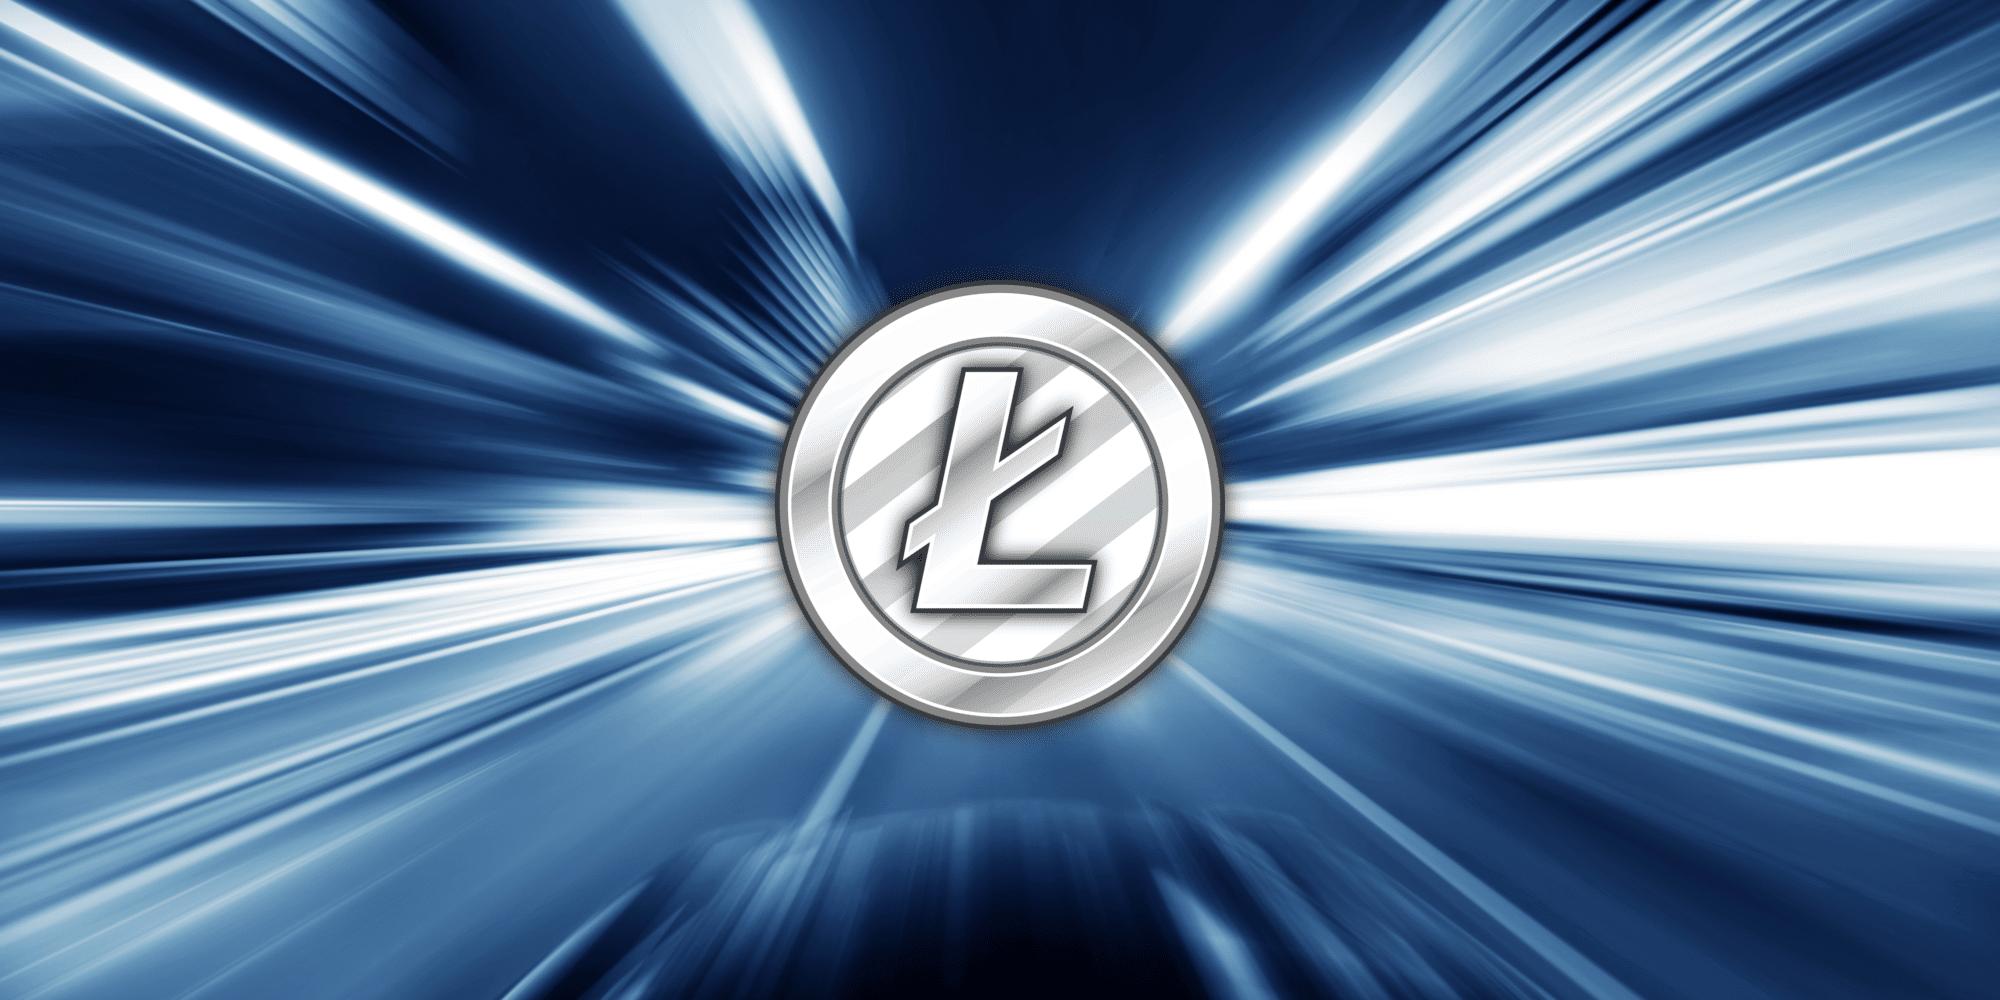 Comment acheter du Litecoin facilement ?